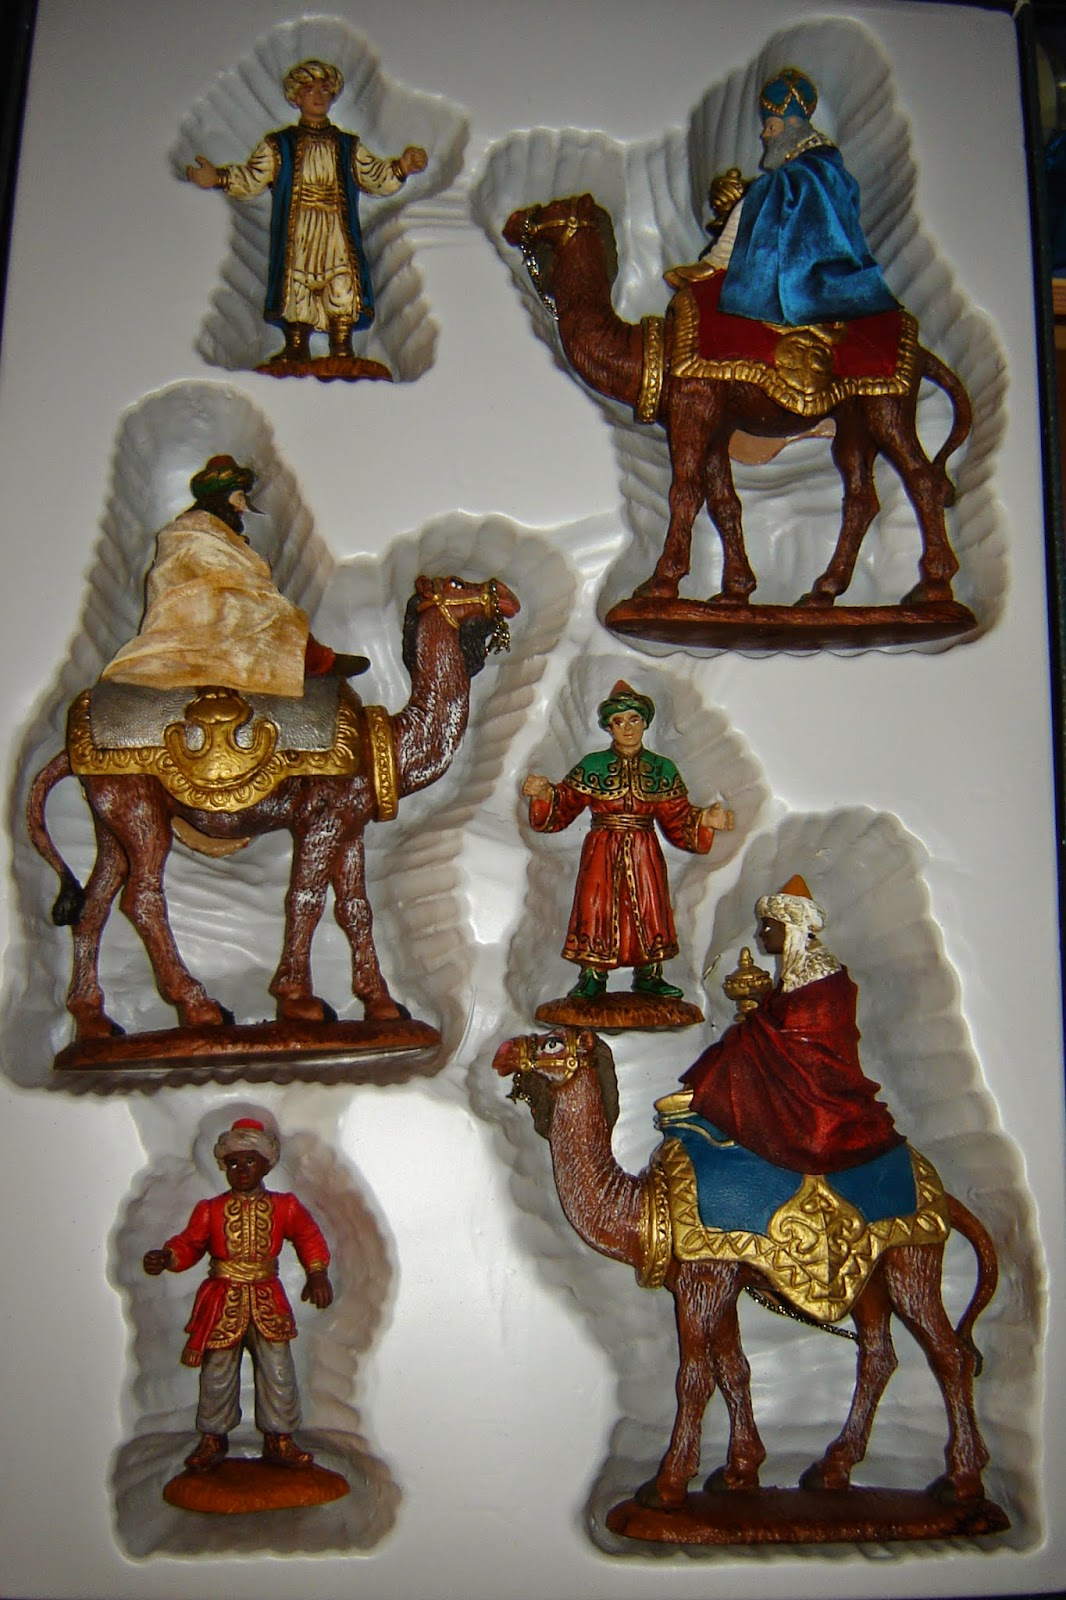 fa3e010a93c Belenes y Complementos Artesanos  Cabalgata de Reyes Magos